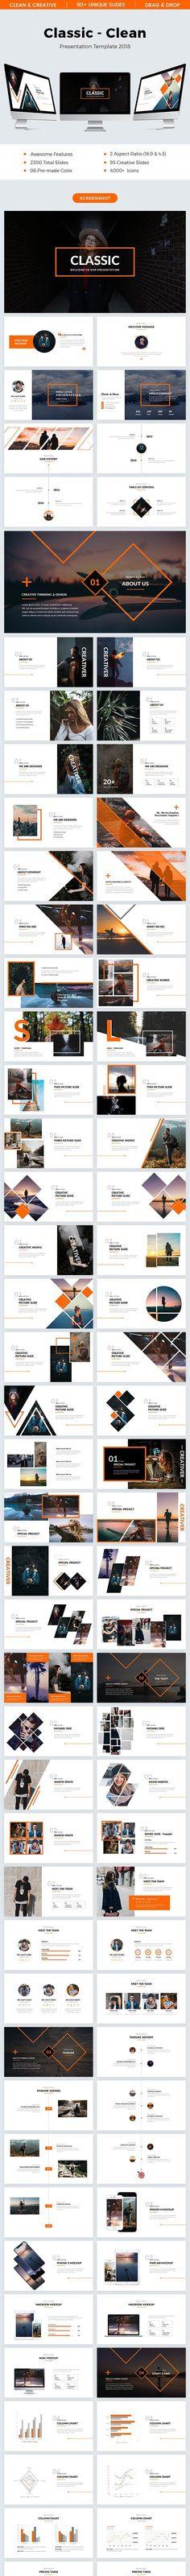 Classic - Clean Powerpoint Template 2018 Creative Presentation by Light_slides. Presentation Design Template, Business Presentation, Creative Powerpoint Templates, Powerpoint Design, Cool Themes, Vector Shapes, Keynote Template, Graphic Design, Design Ppt